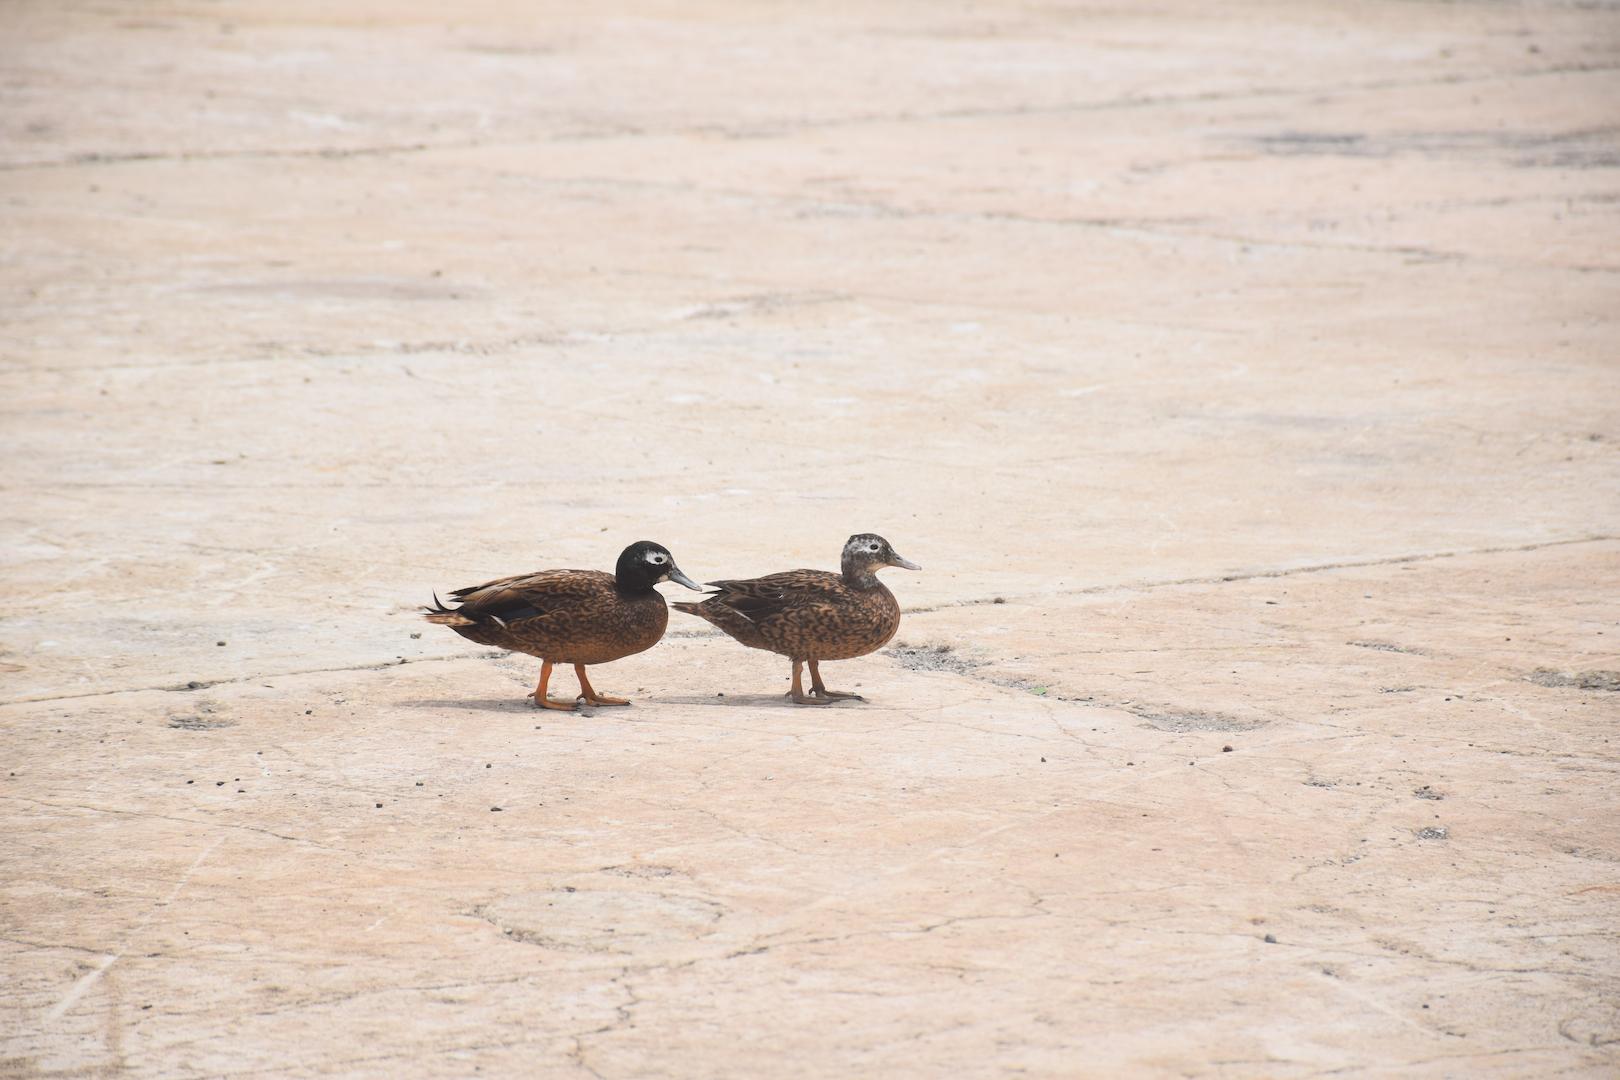 Laysan duck, endangered, pair, rare, bird, most endangered duck, Midway, Atoll, Island, Laysan